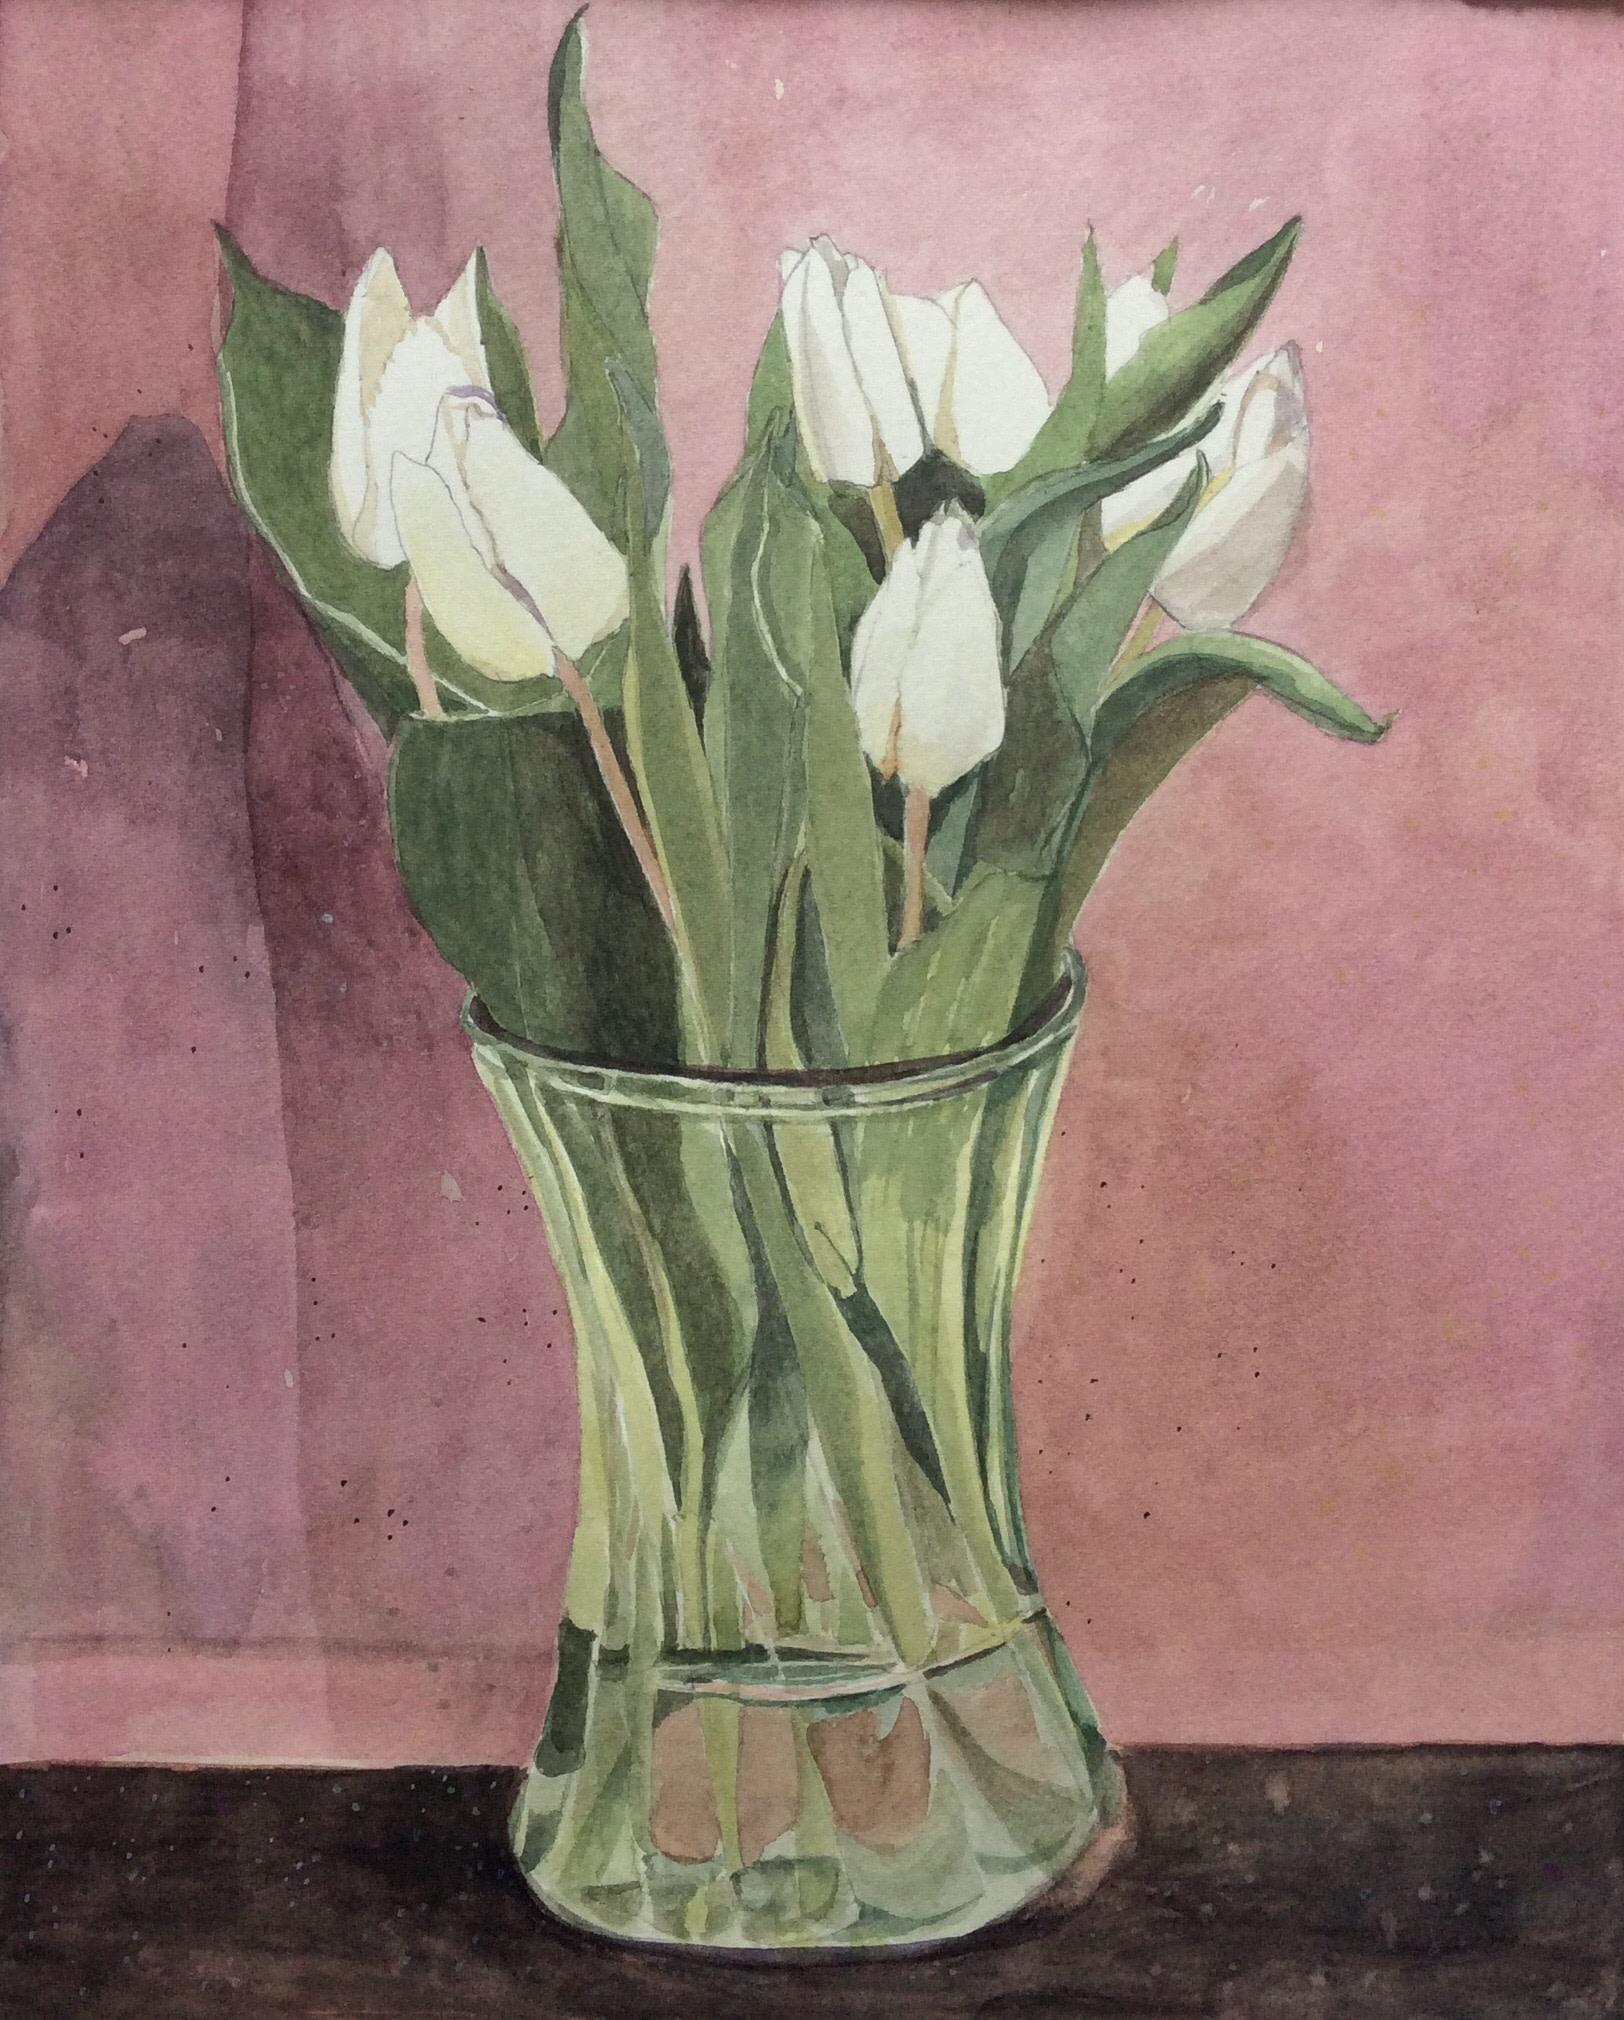 "<span class=""link fancybox-details-link""><a href=""/artists/168-suzy-fasht/works/12049-suzy-fasht-white-tulips/"">View Detail Page</a></span><div class=""artist""><span class=""artist""><strong>Suzy Fasht</strong></span></div><div class=""title""><em>White Tulips</em></div><div class=""medium"">watercolour</div><div class=""dimensions"">Frame: 32 x 26 cm<br /> Artwork: 44 x 38 cm</div><div class=""price"">£450.00</div>"